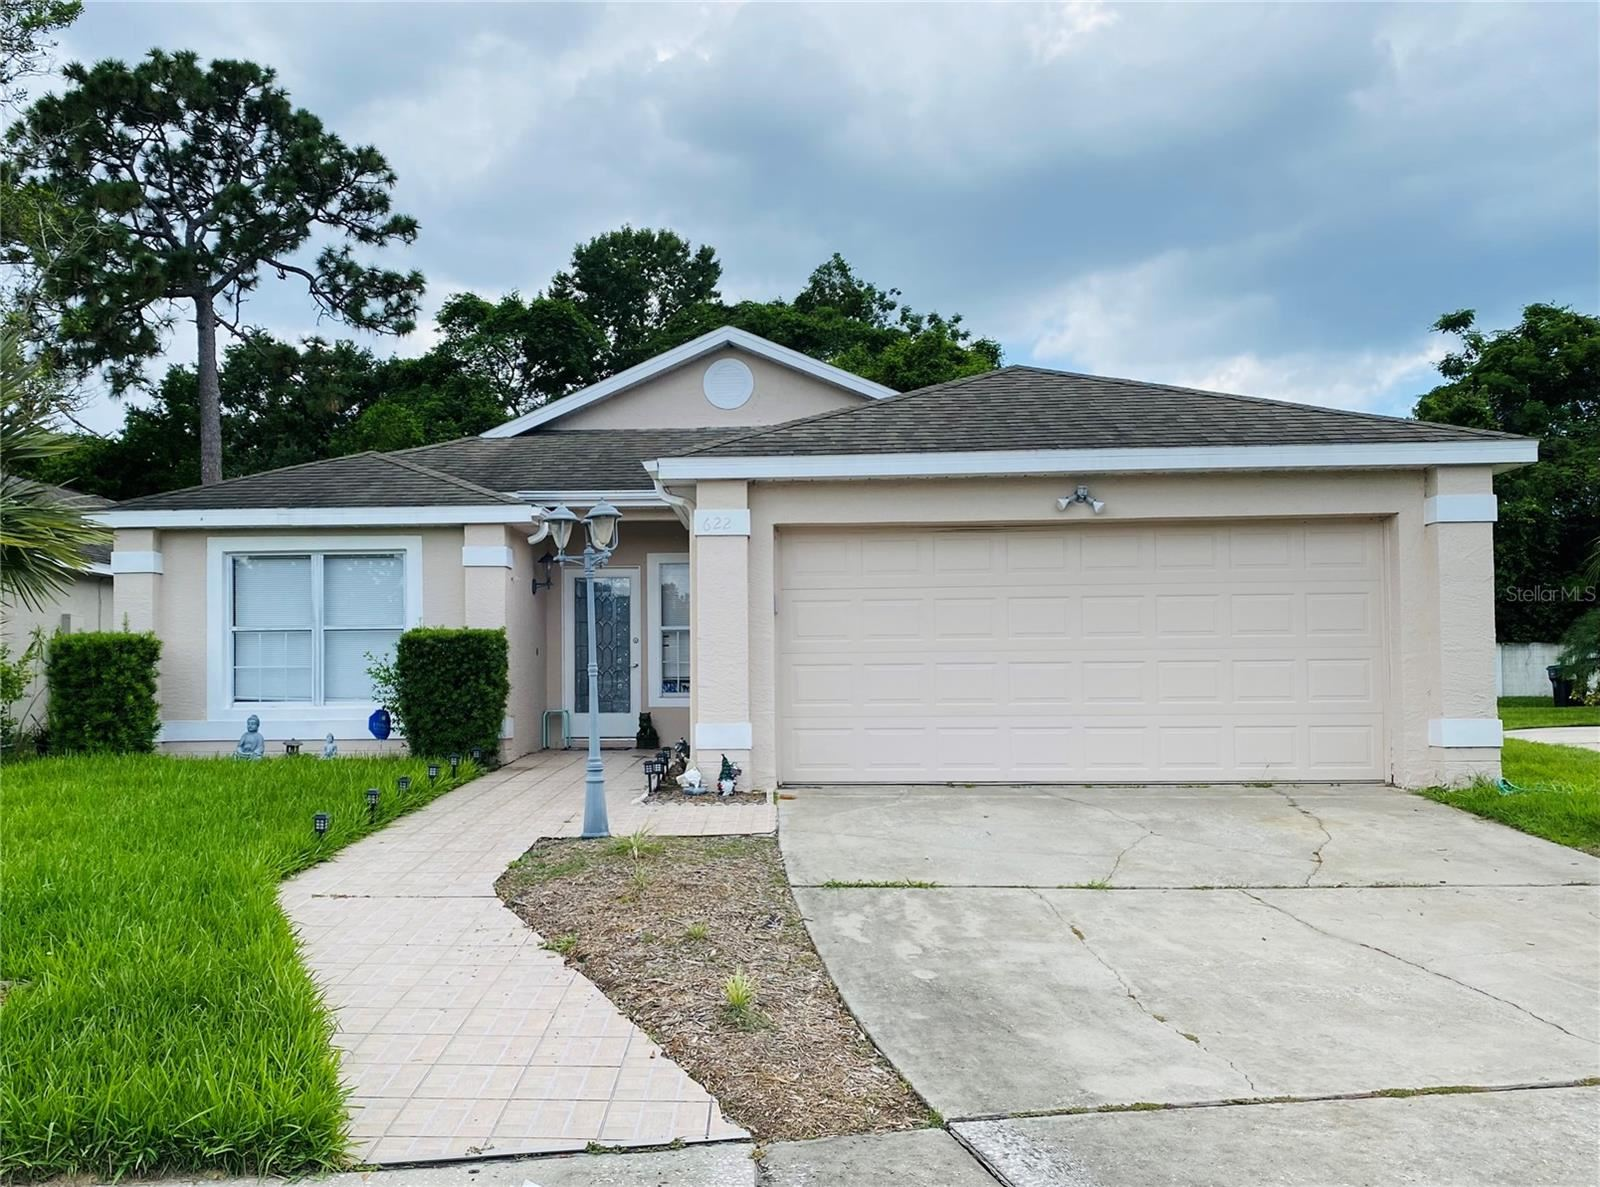 622 SHORT PINE CIRCLE, Orlando, FL 32807 - #: O5960367